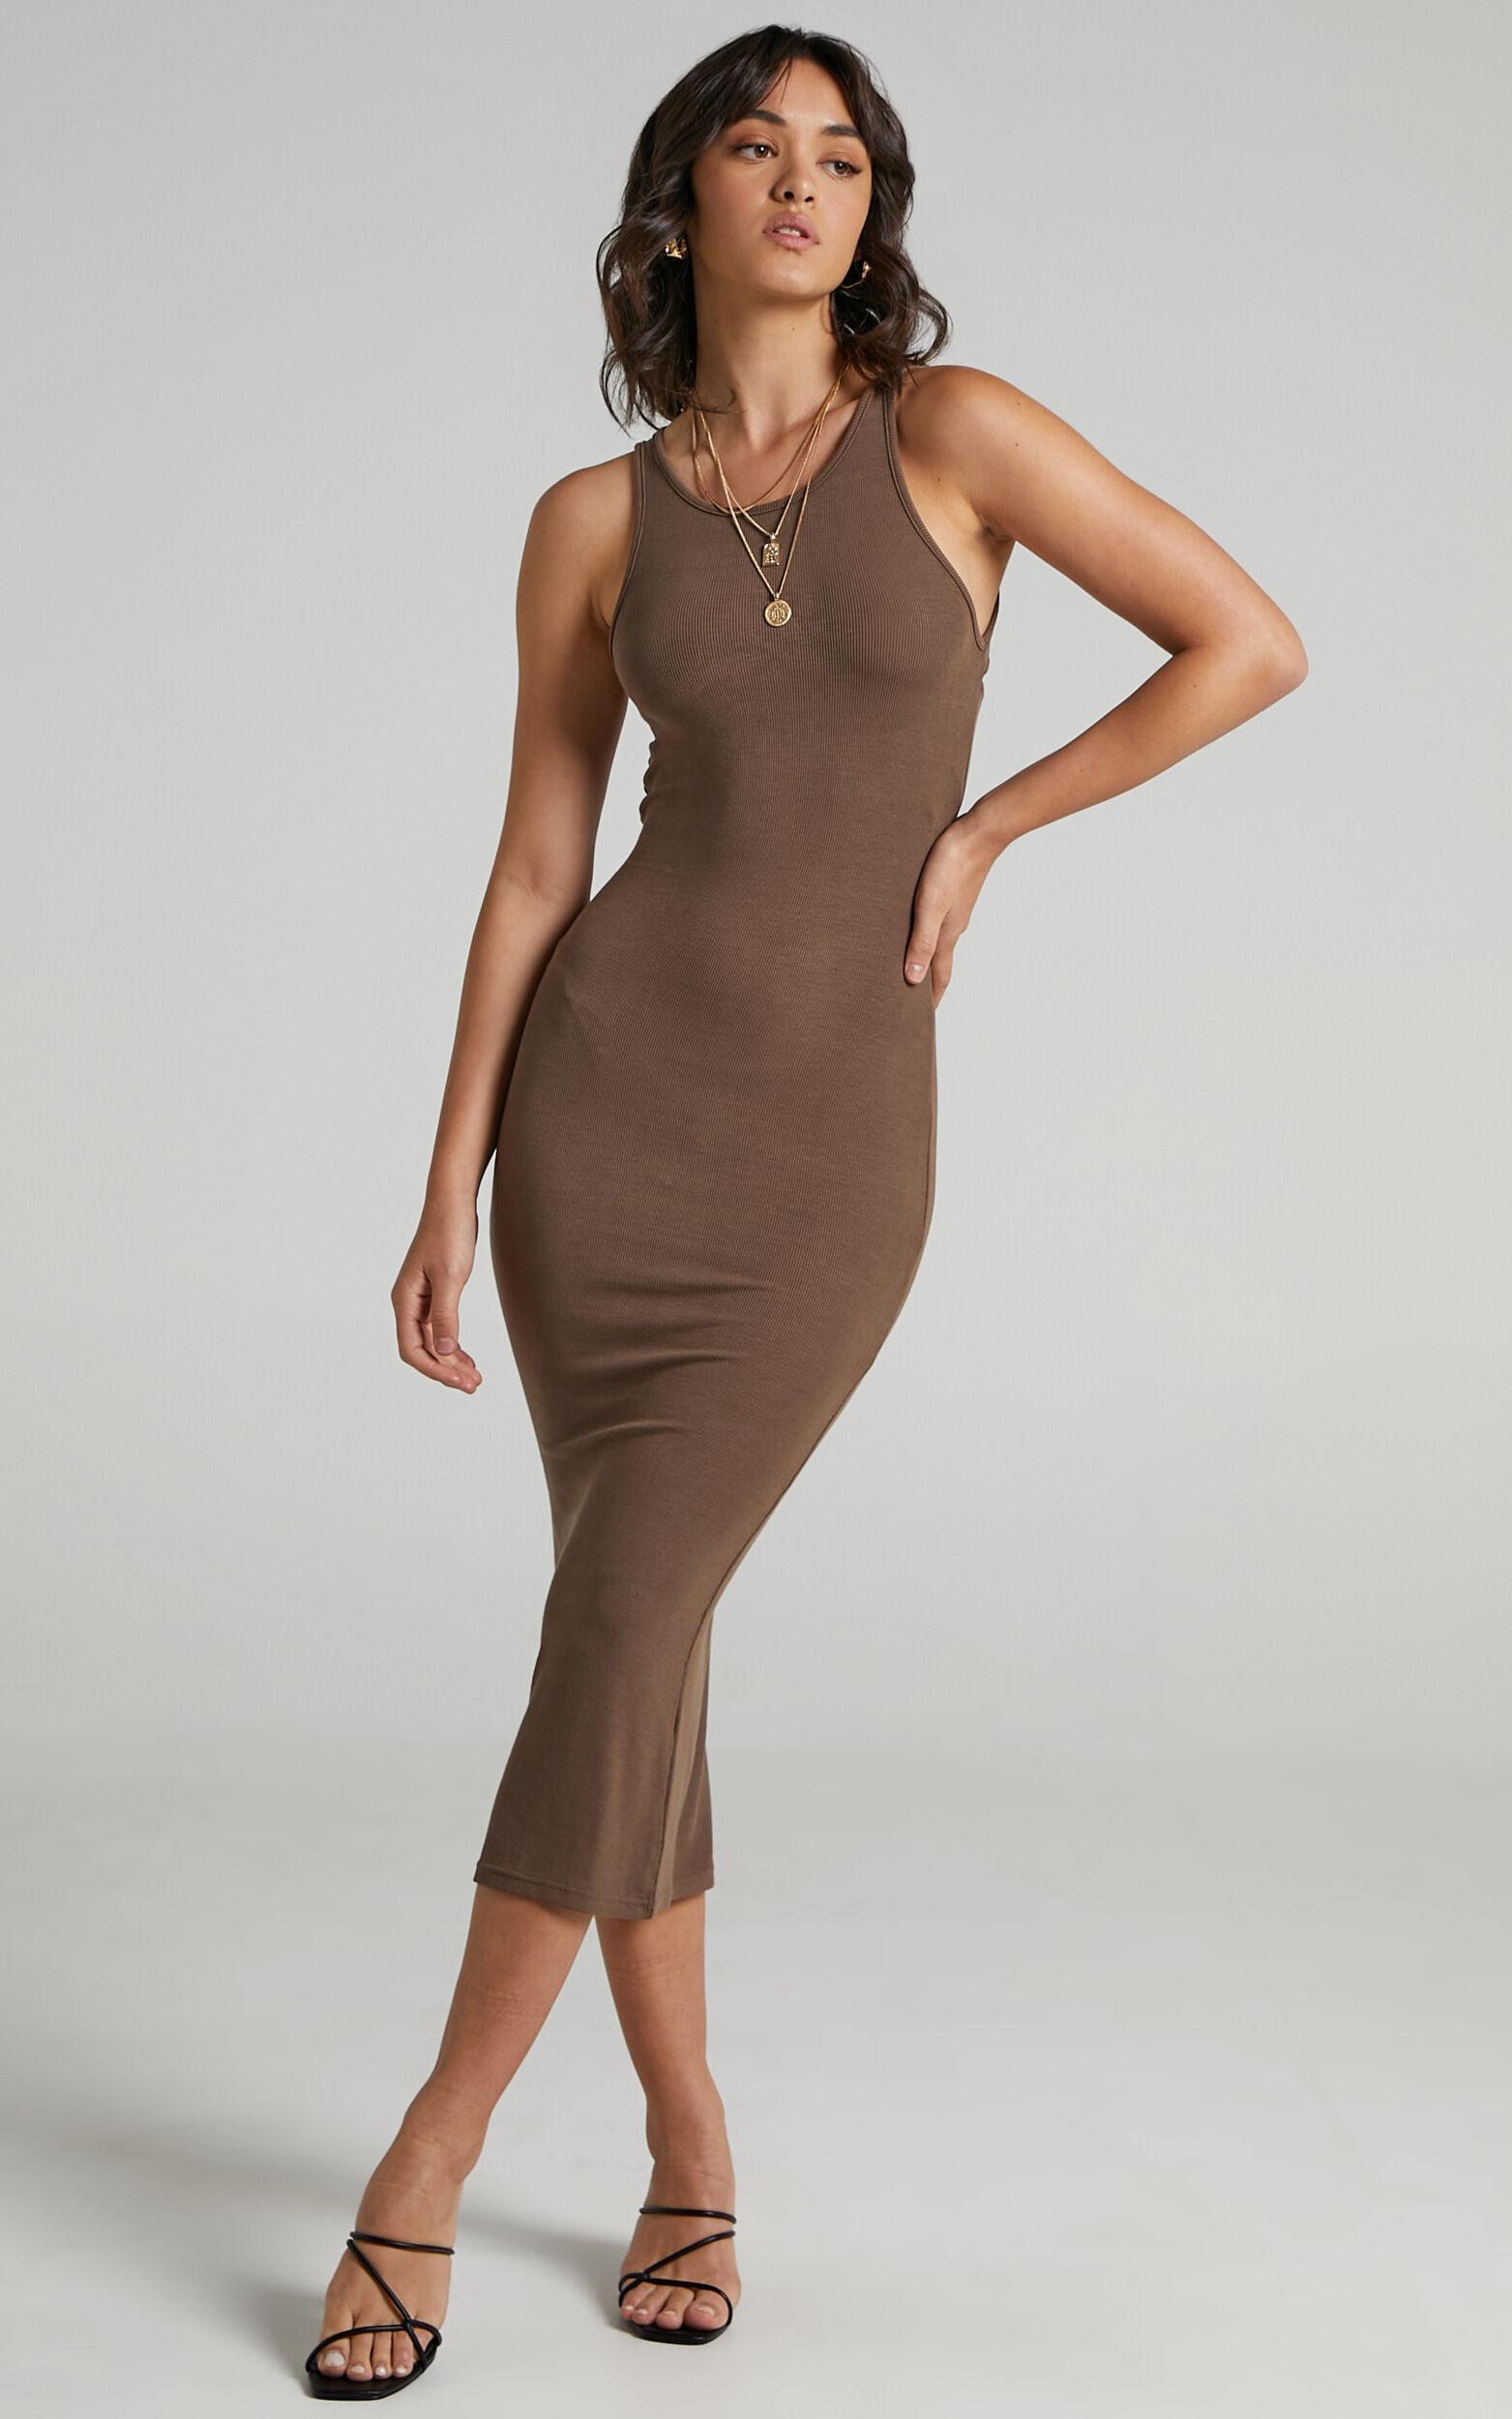 Laya Dress in Chocolate - 08, BRN1, super-hi-res image number null